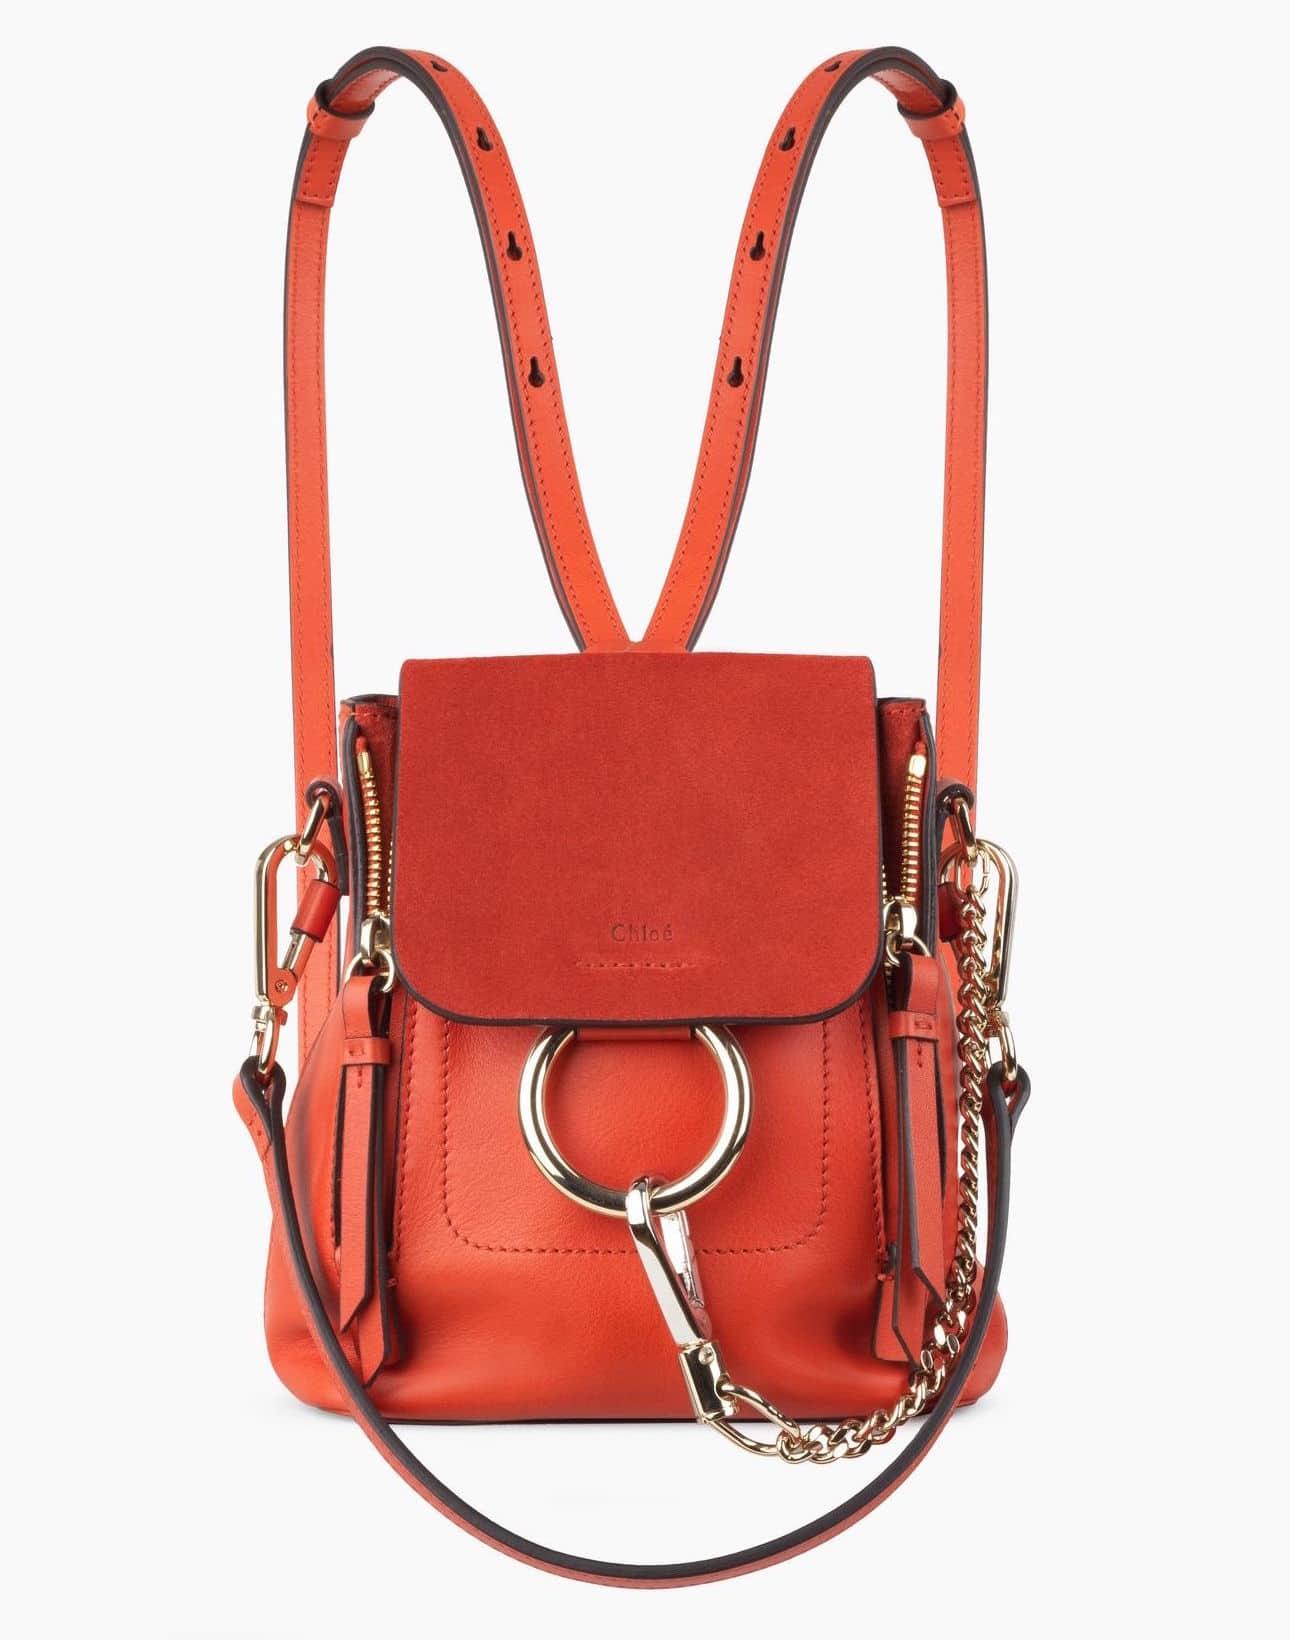 chloe faye backpack bag reference guide spotted fashion. Black Bedroom Furniture Sets. Home Design Ideas